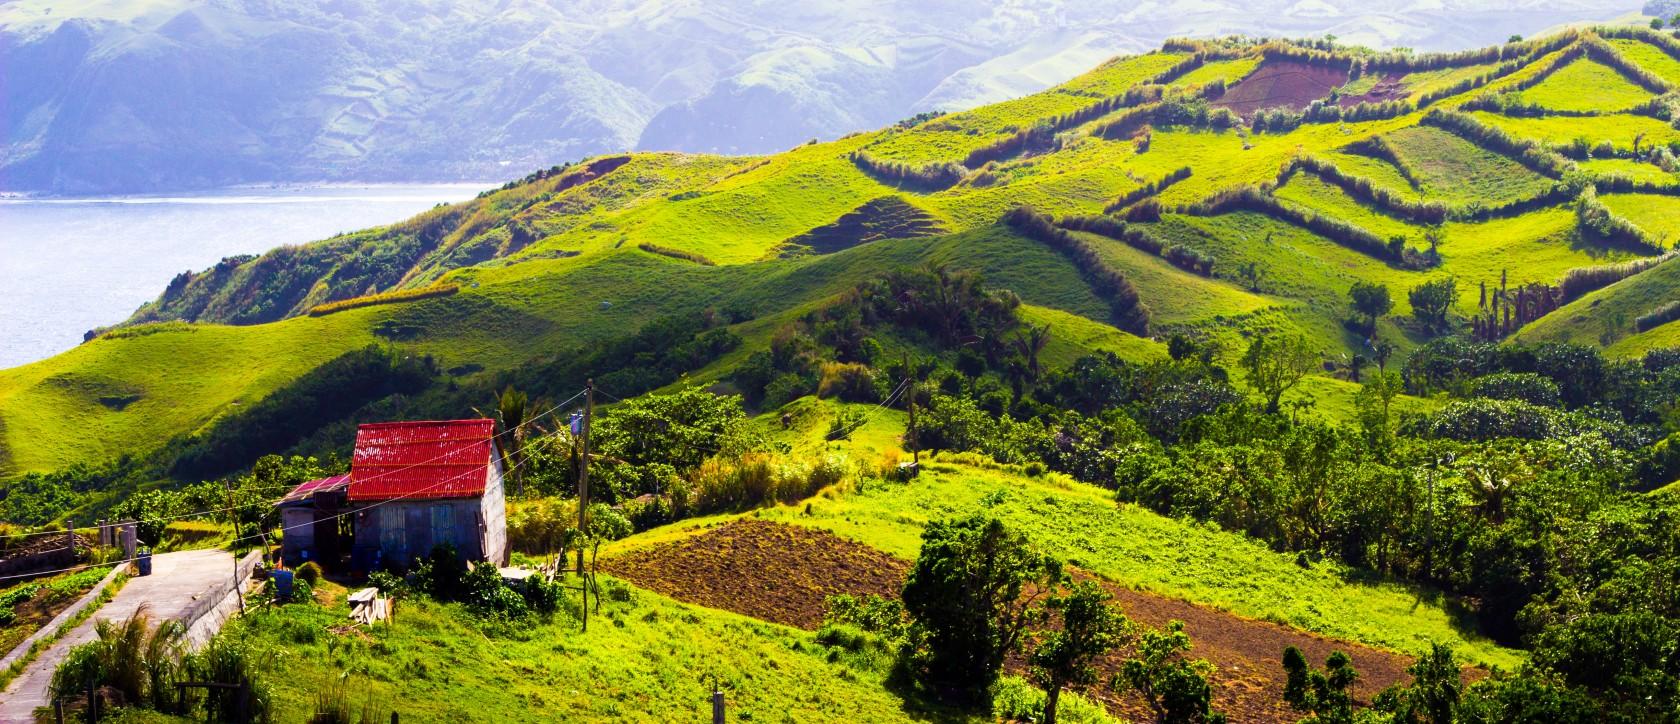 Cảnh đẹp Philippine